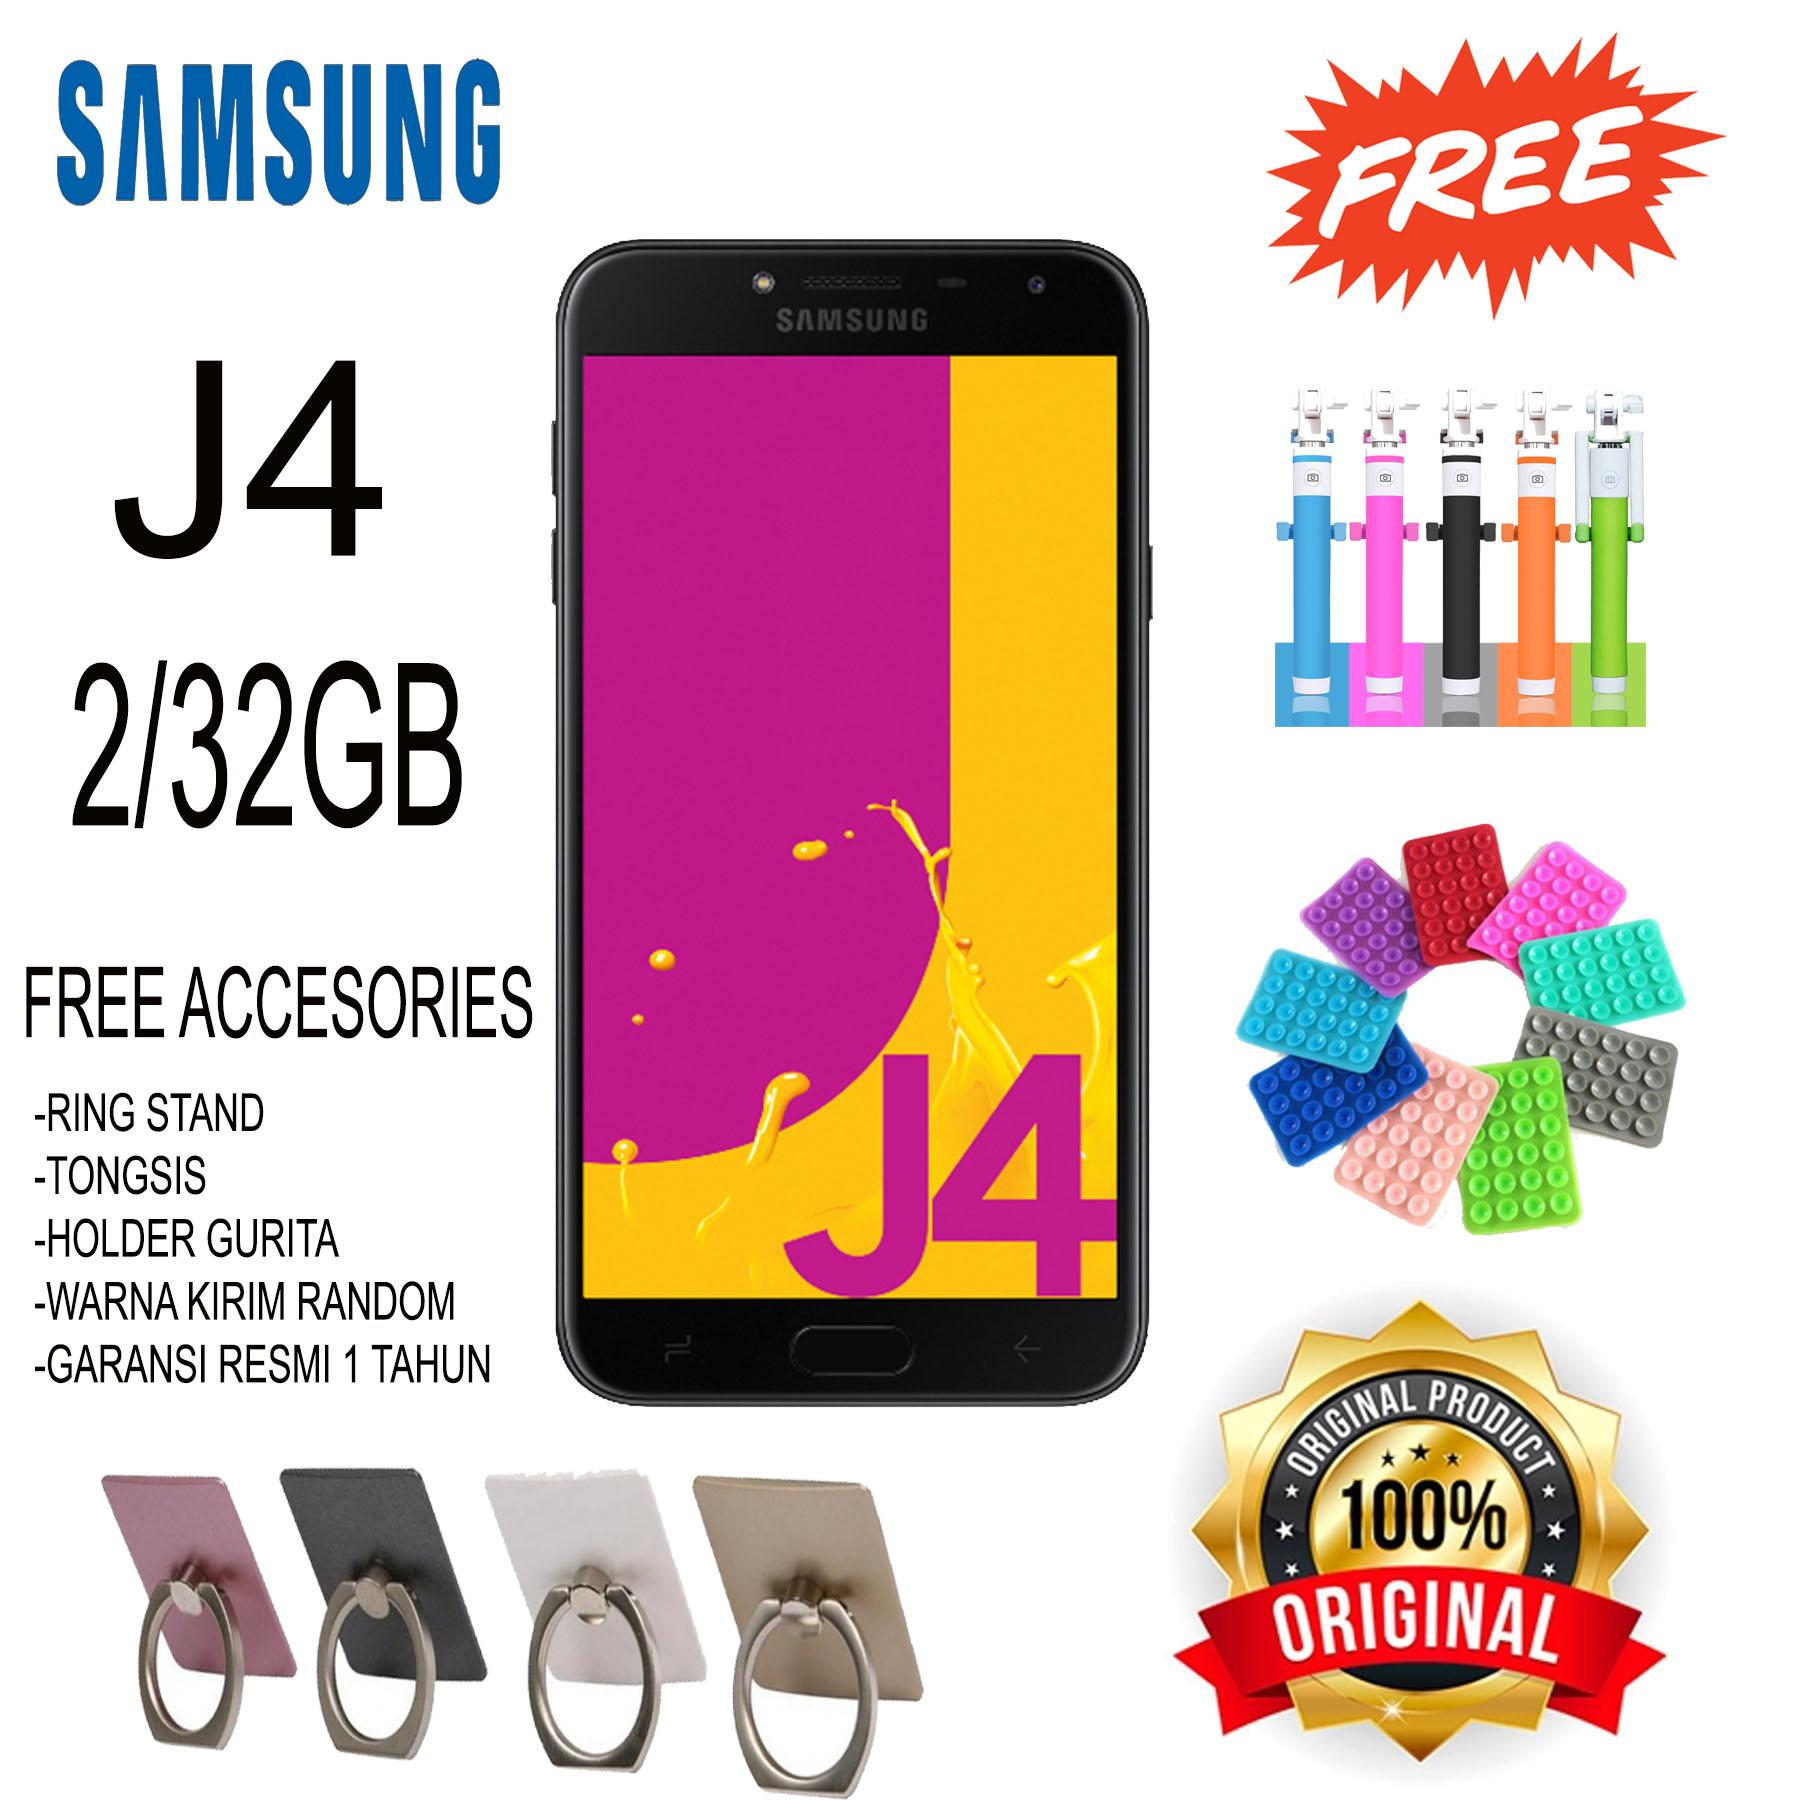 Samsung Galaxy J4 Smartphone - 32GB/ 2GB - Garansi Resmi - Free Accesories